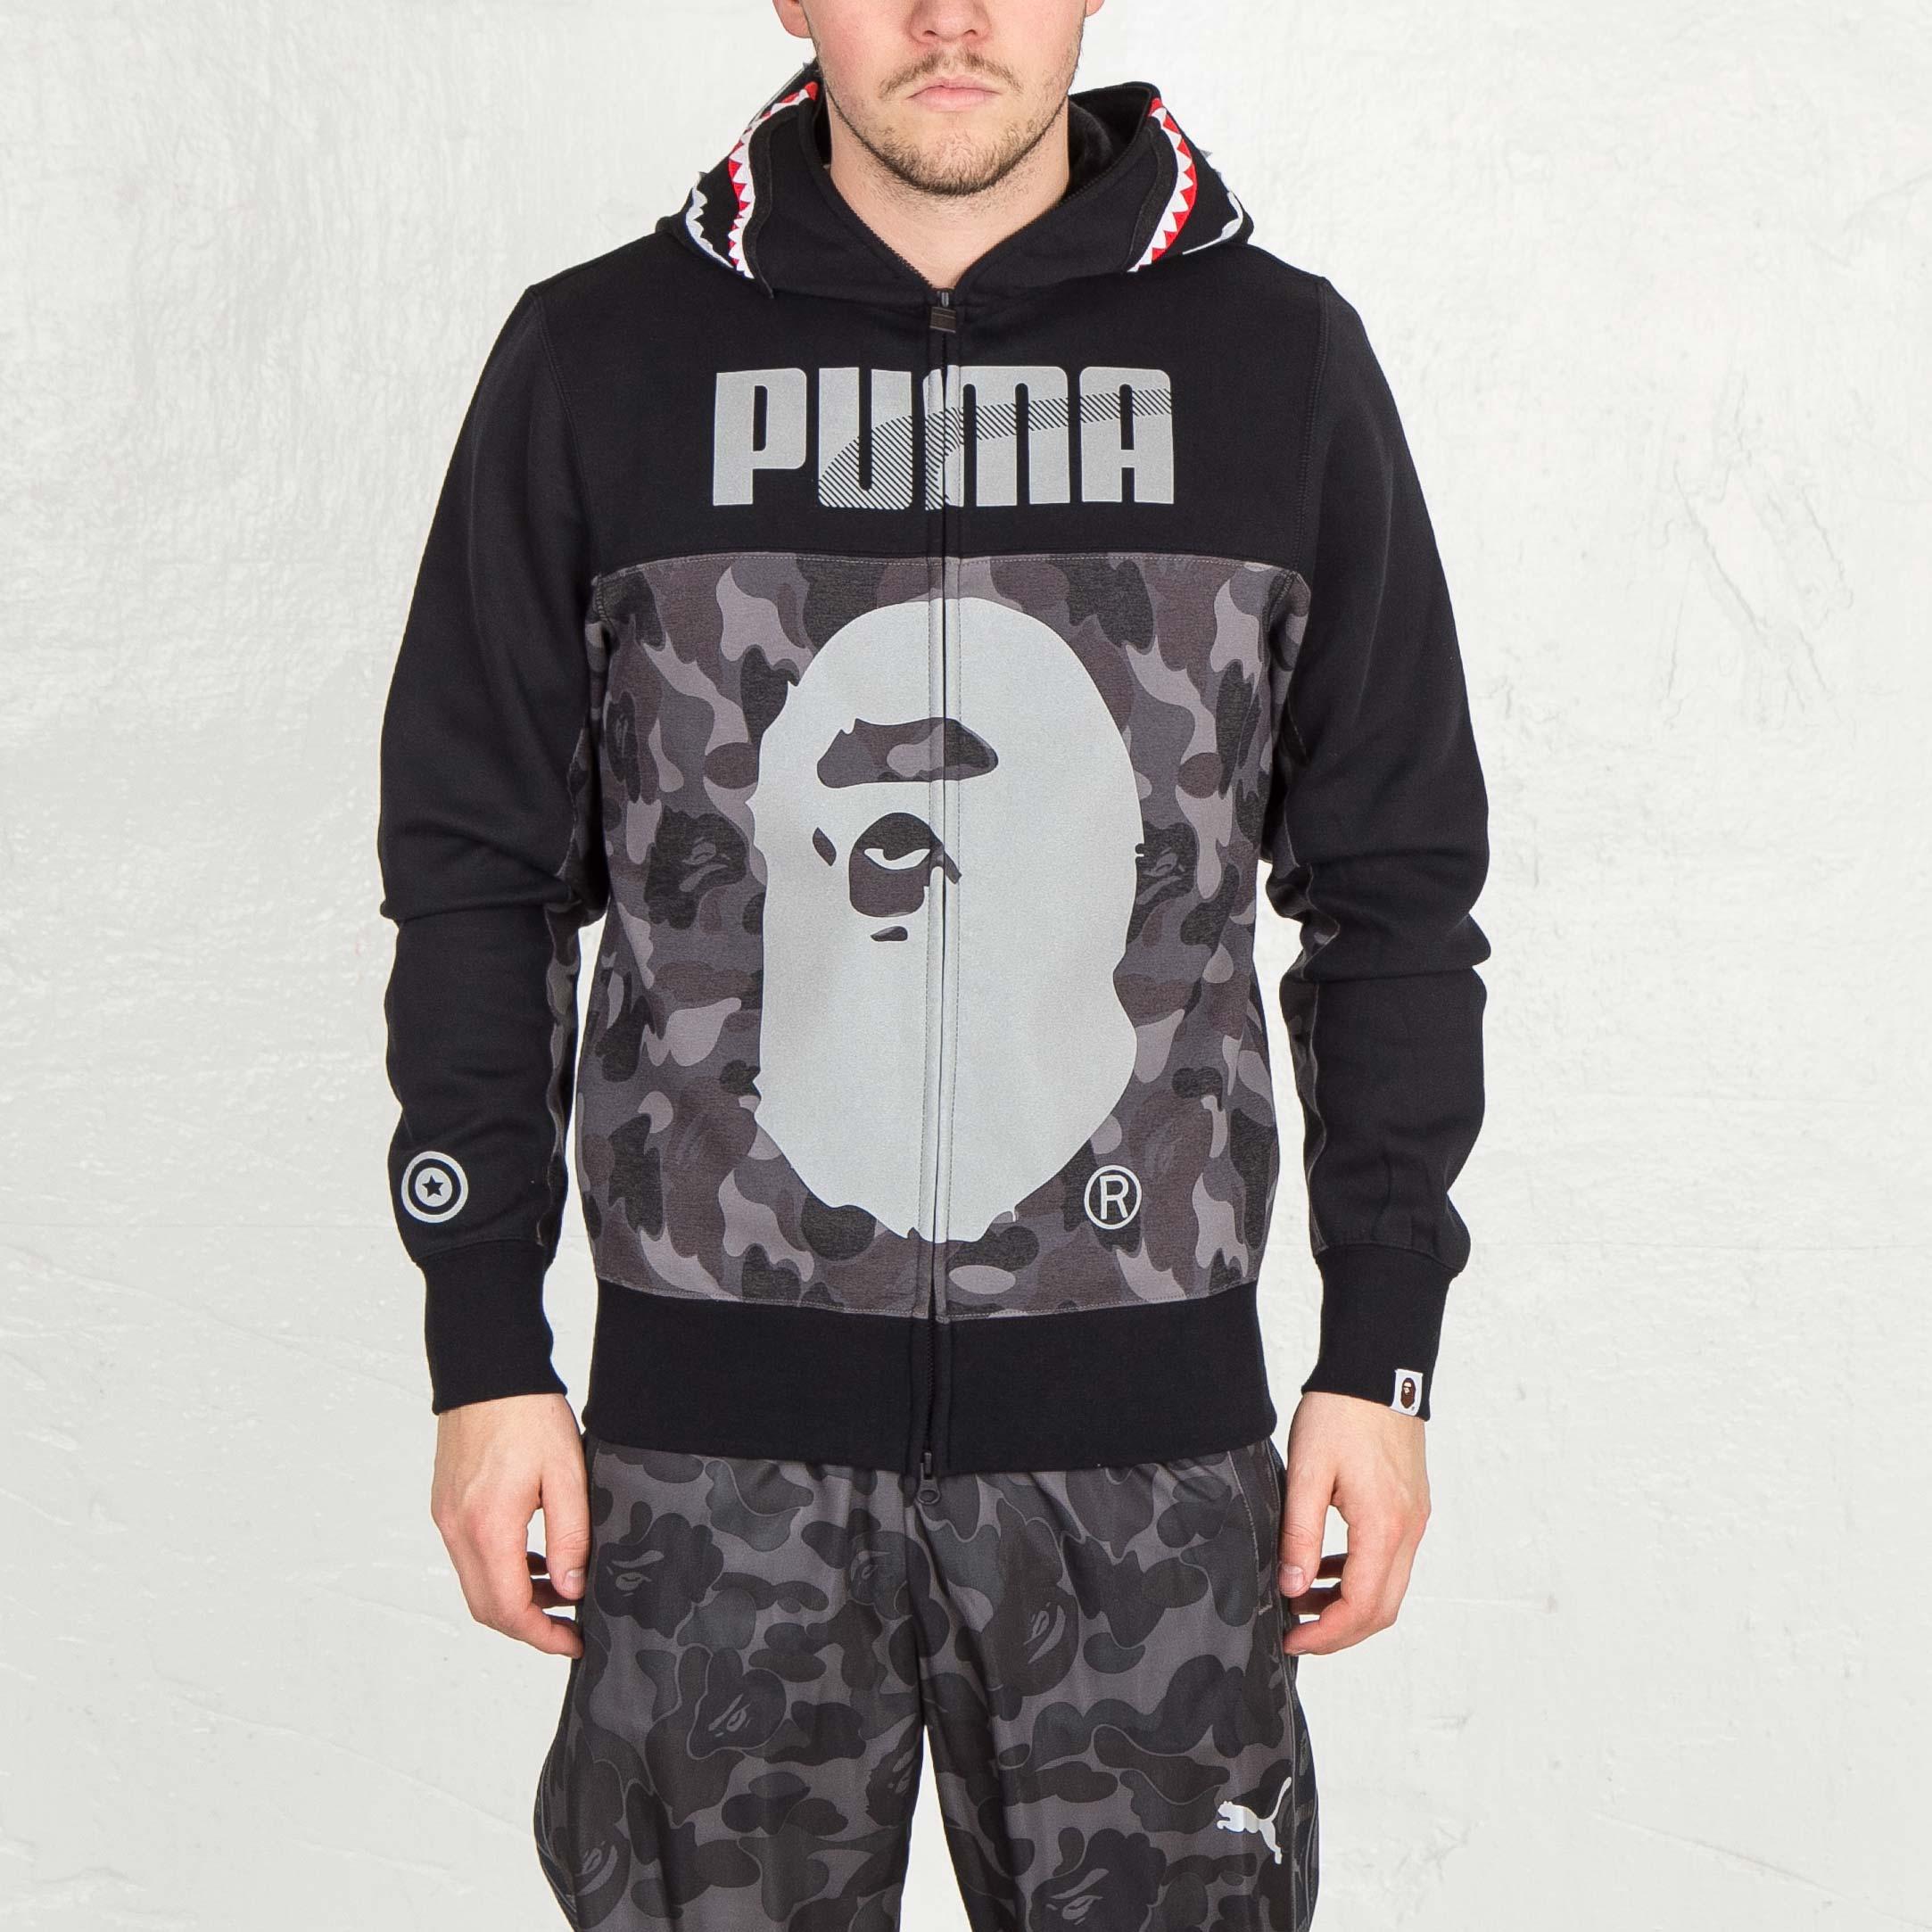 cb433cac01a4 Puma Bape Shark Hoodie - 569619-01 - Sneakersnstuff